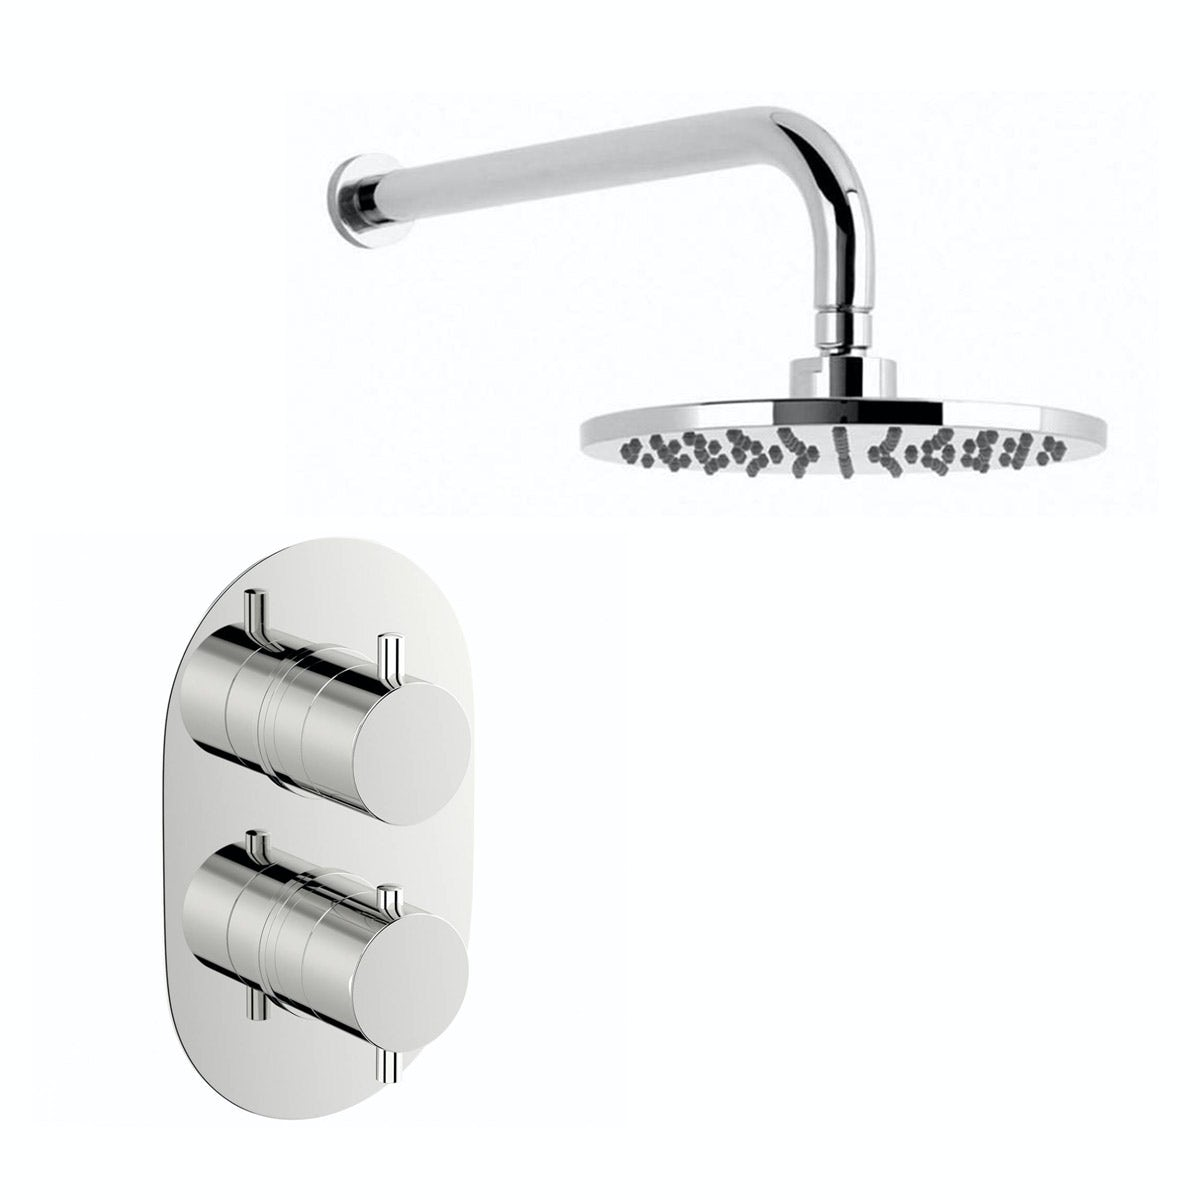 Mode Harrison thermostatic shower valve shower set